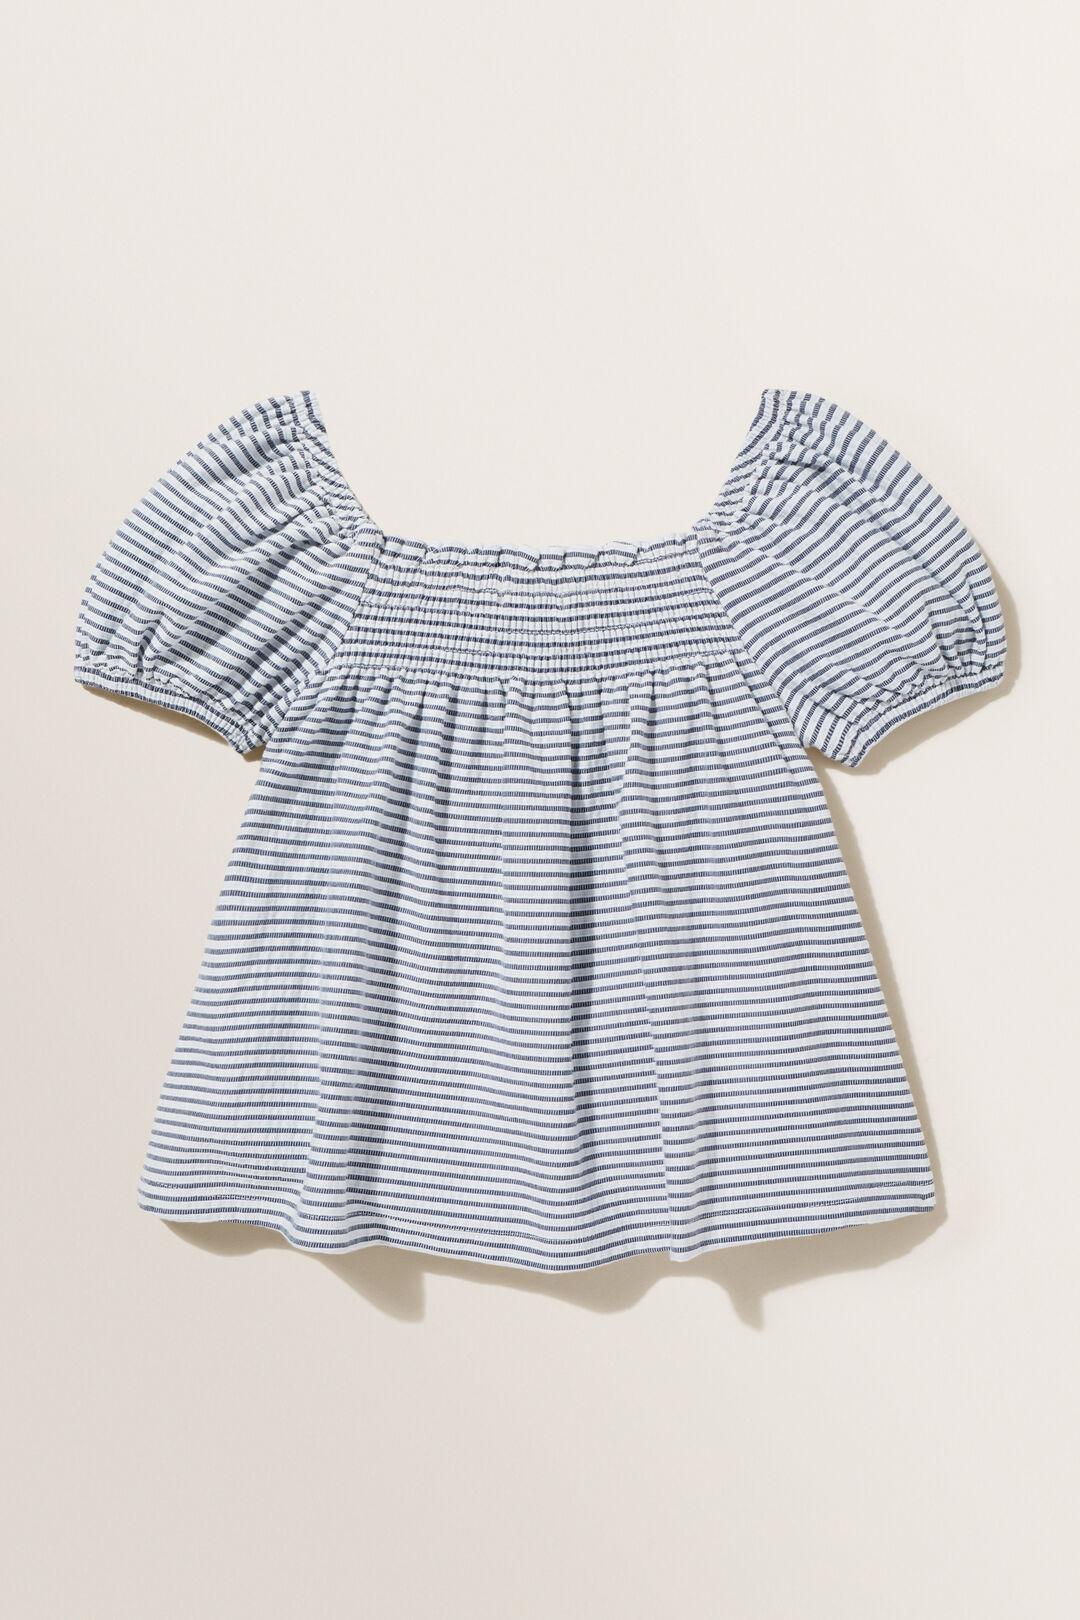 Stripe Shirred Top  MIDNIGHT  hi-res